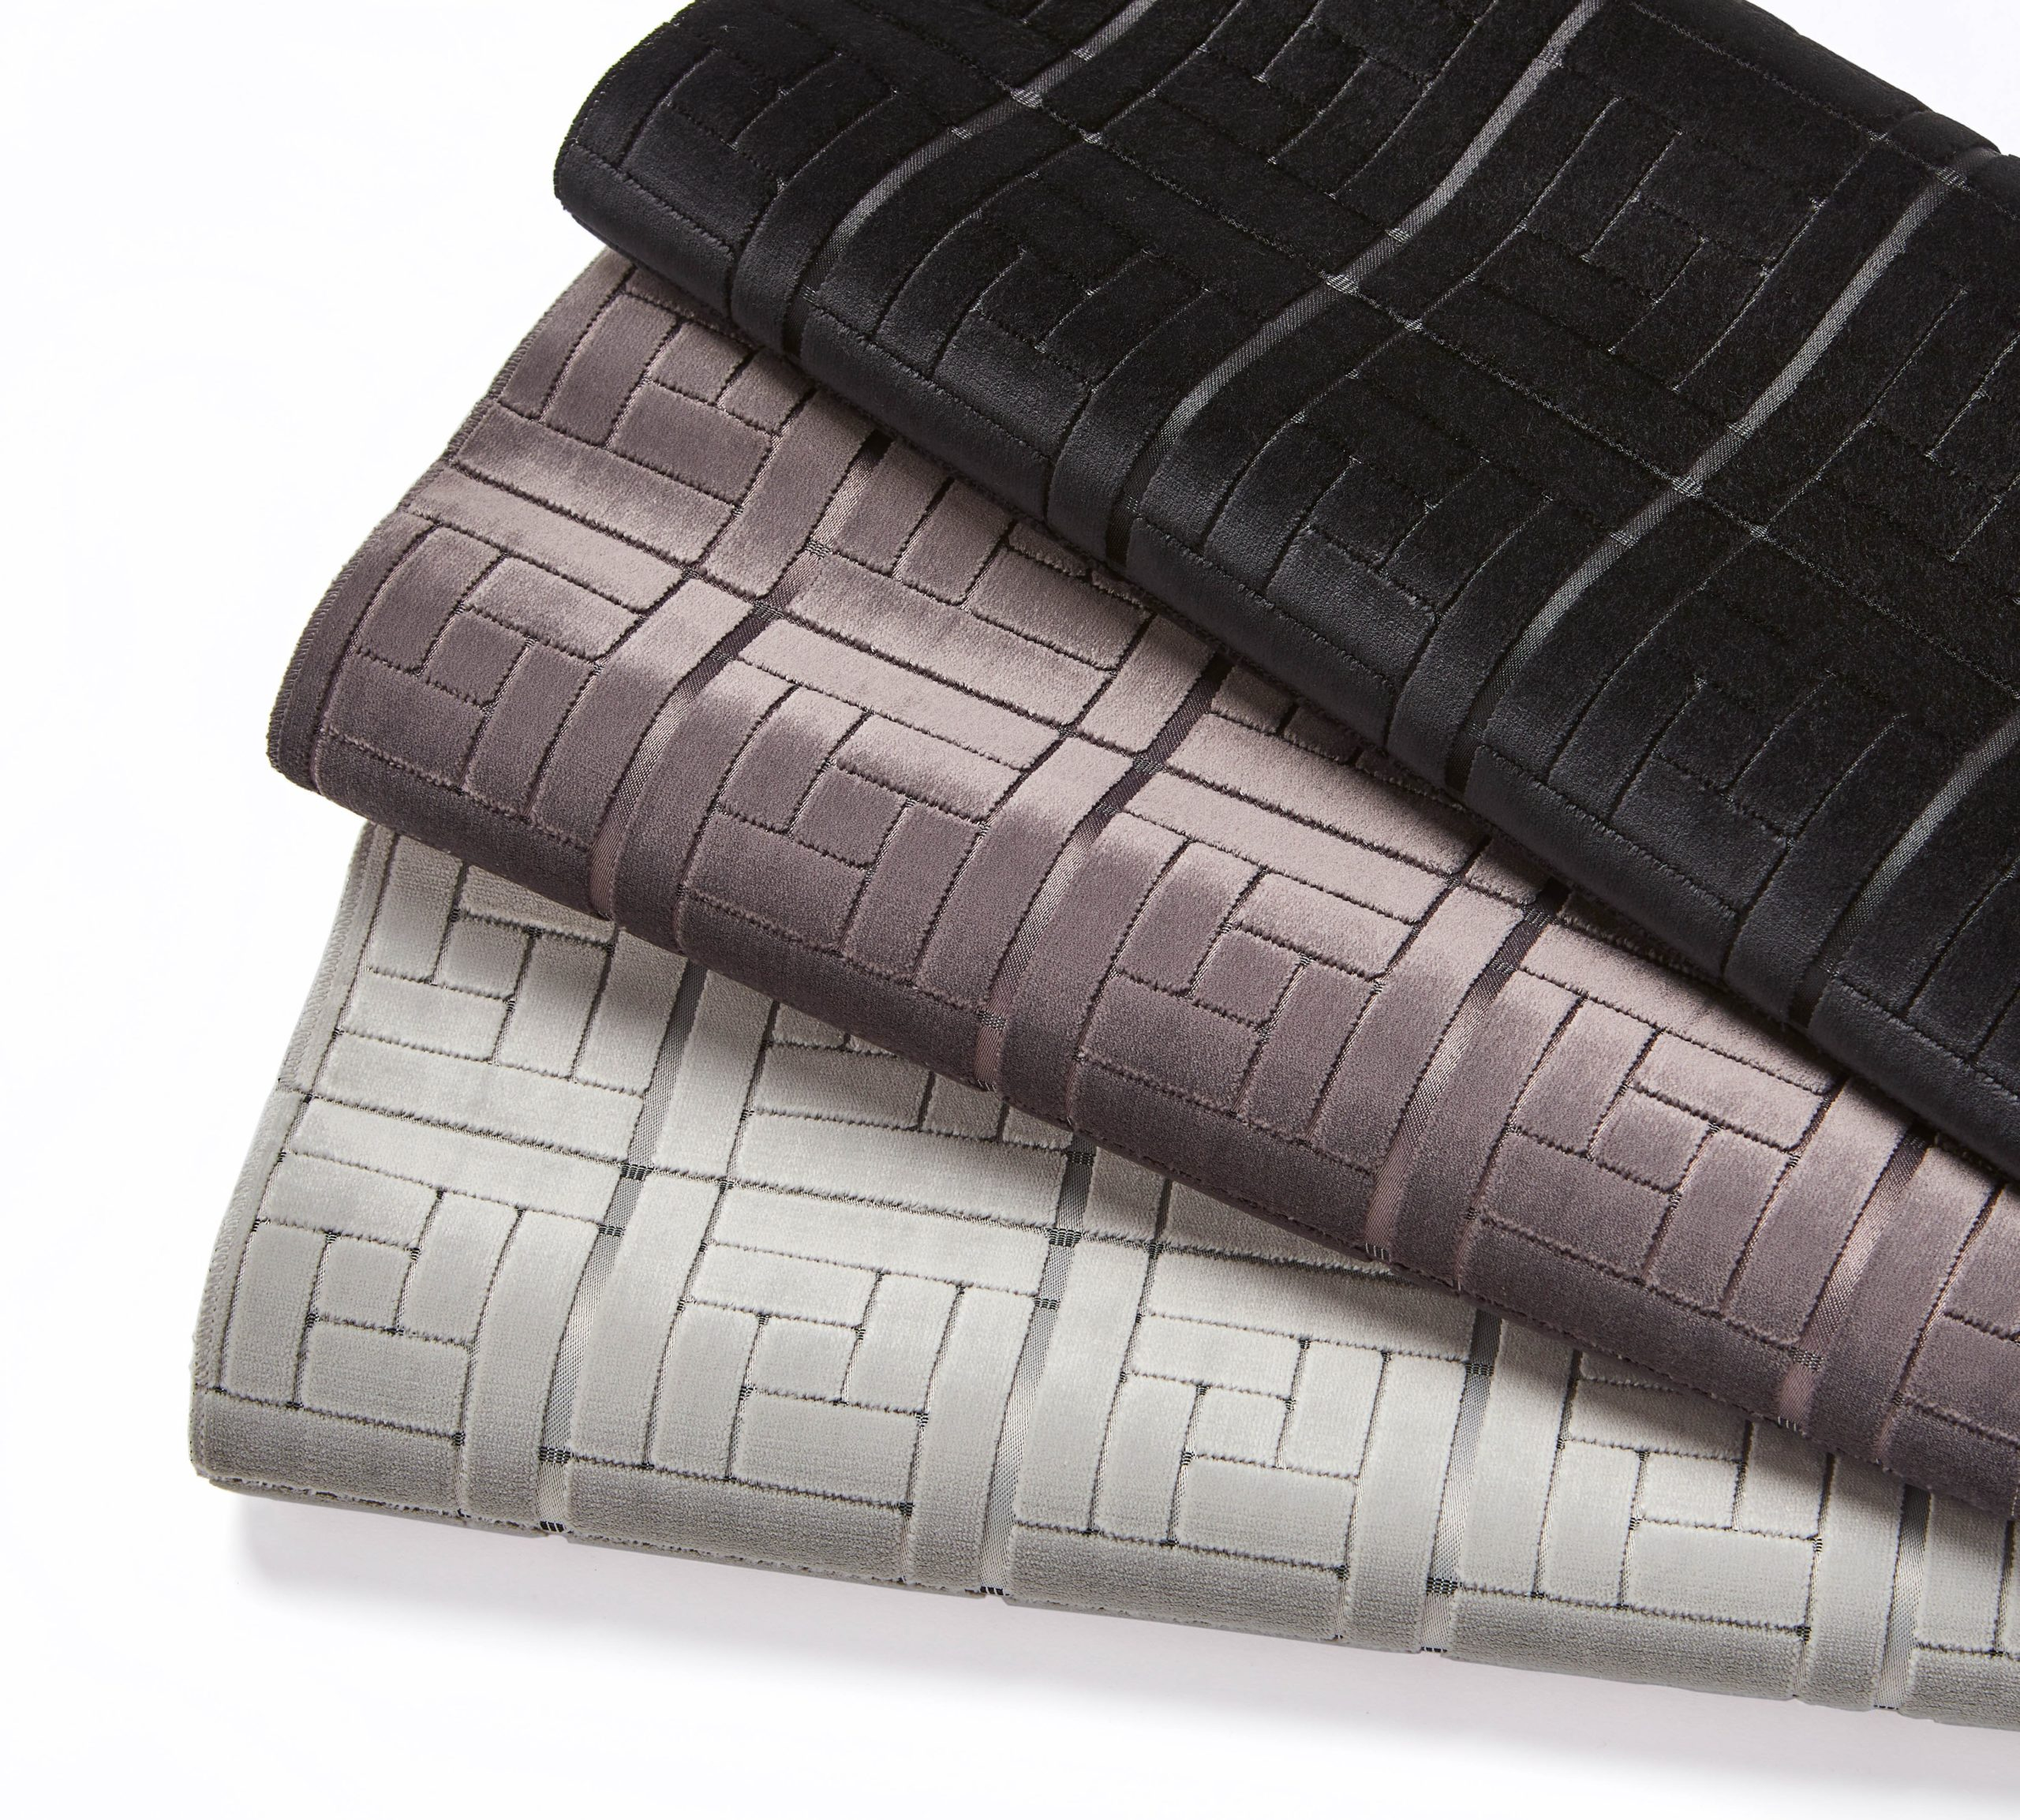 arc_com_Paxton_fabric_2-scaled-6